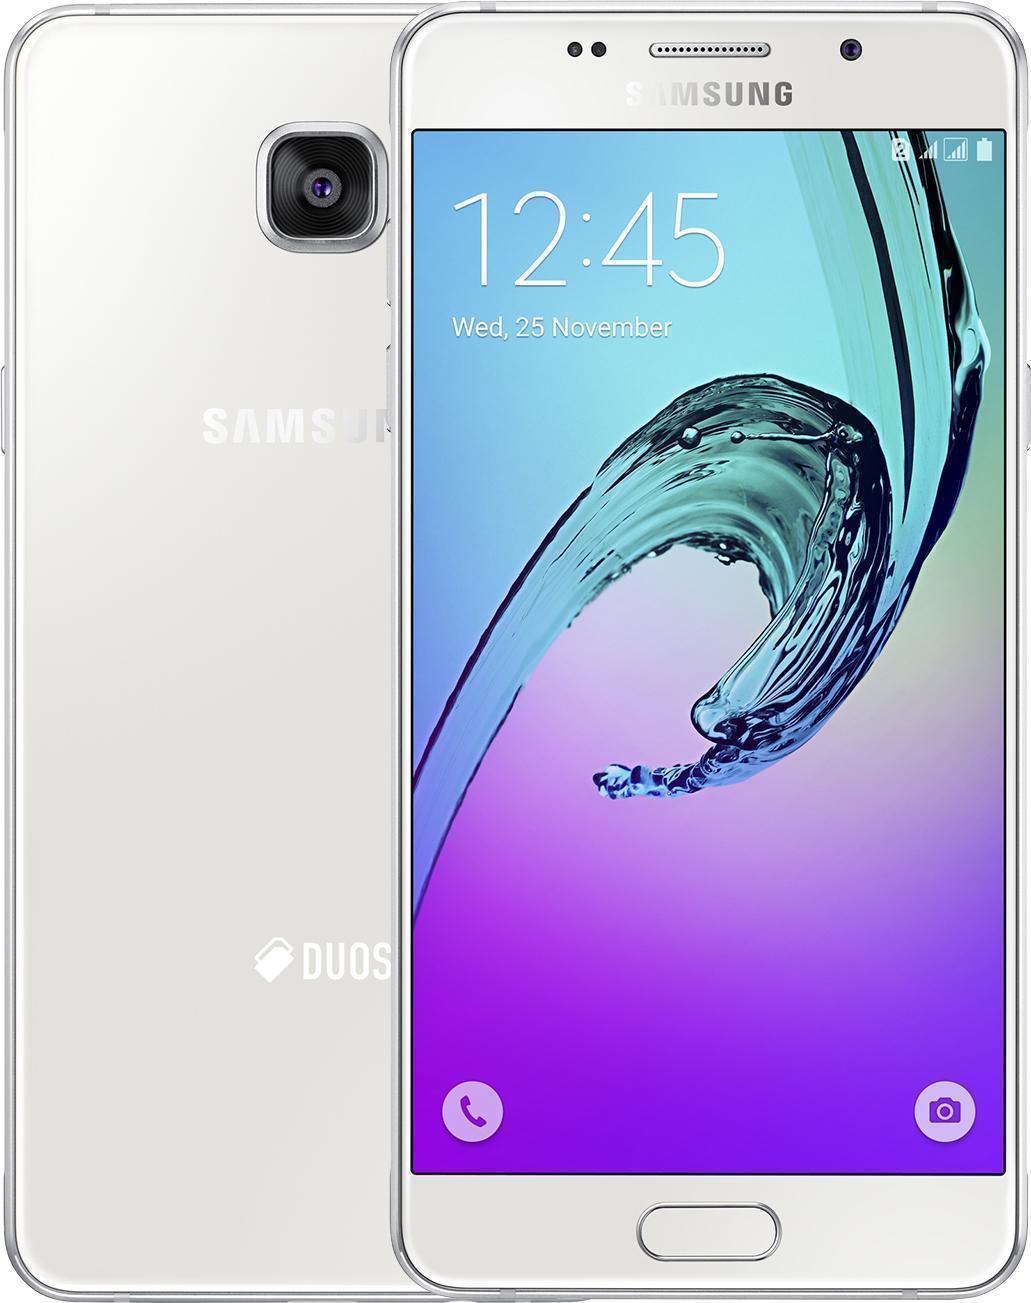 Samsung Galaxy A5 (2016) (SM-A510F/DS) White (SM-A510FZWDSER)Samsung<br>Samsung Galaxy A5 (2016) (SM-A510F/DS) White (SM-A510FZWDSER)<br>